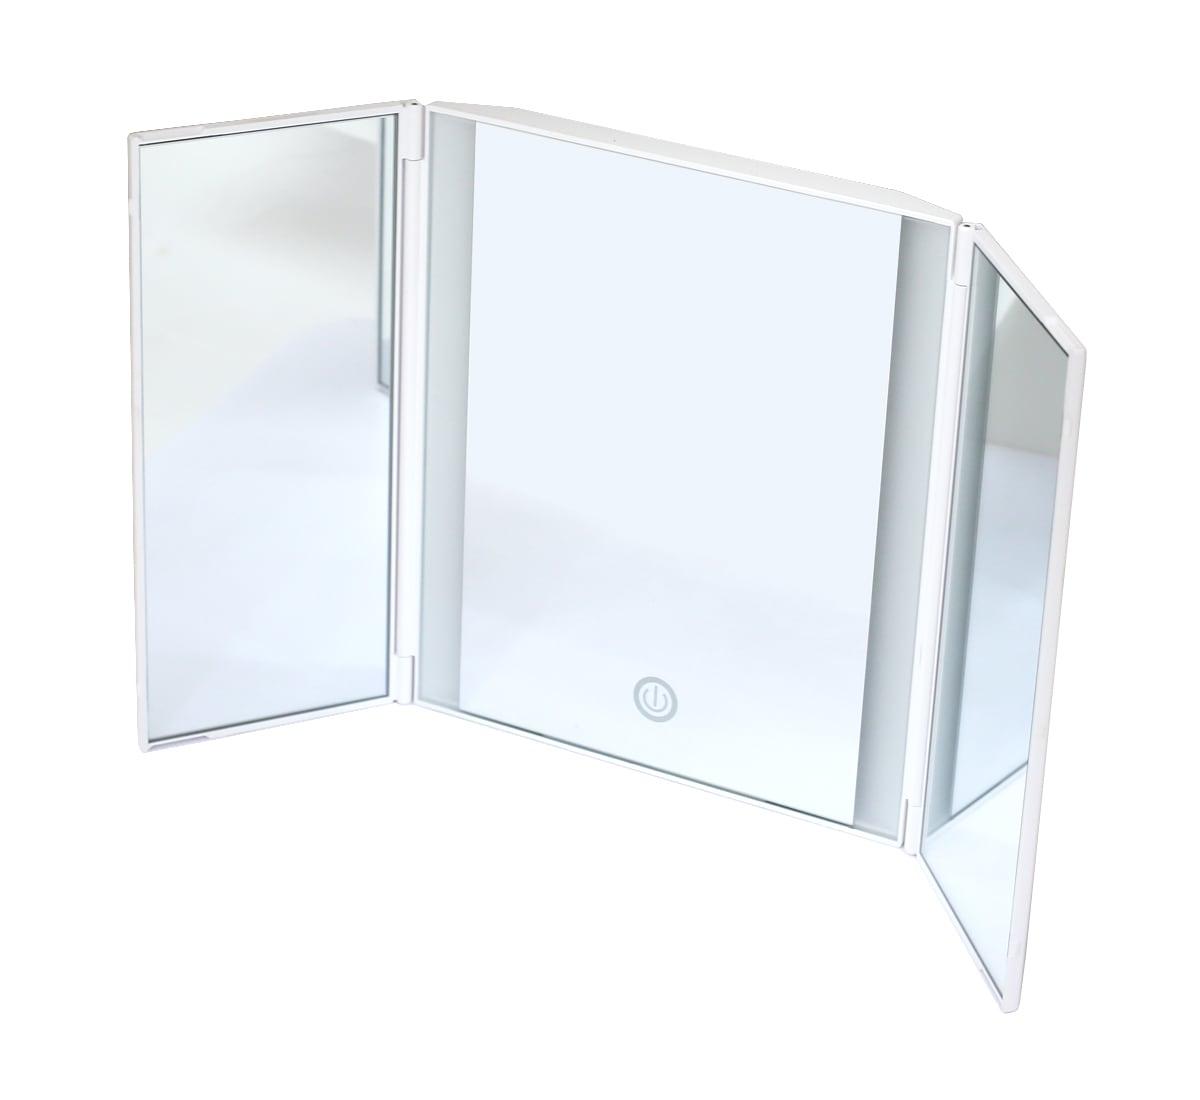 CONAIR(コンエアー)イルミネーションズ LEDイルミネーションミラー 鏡を開いた様子